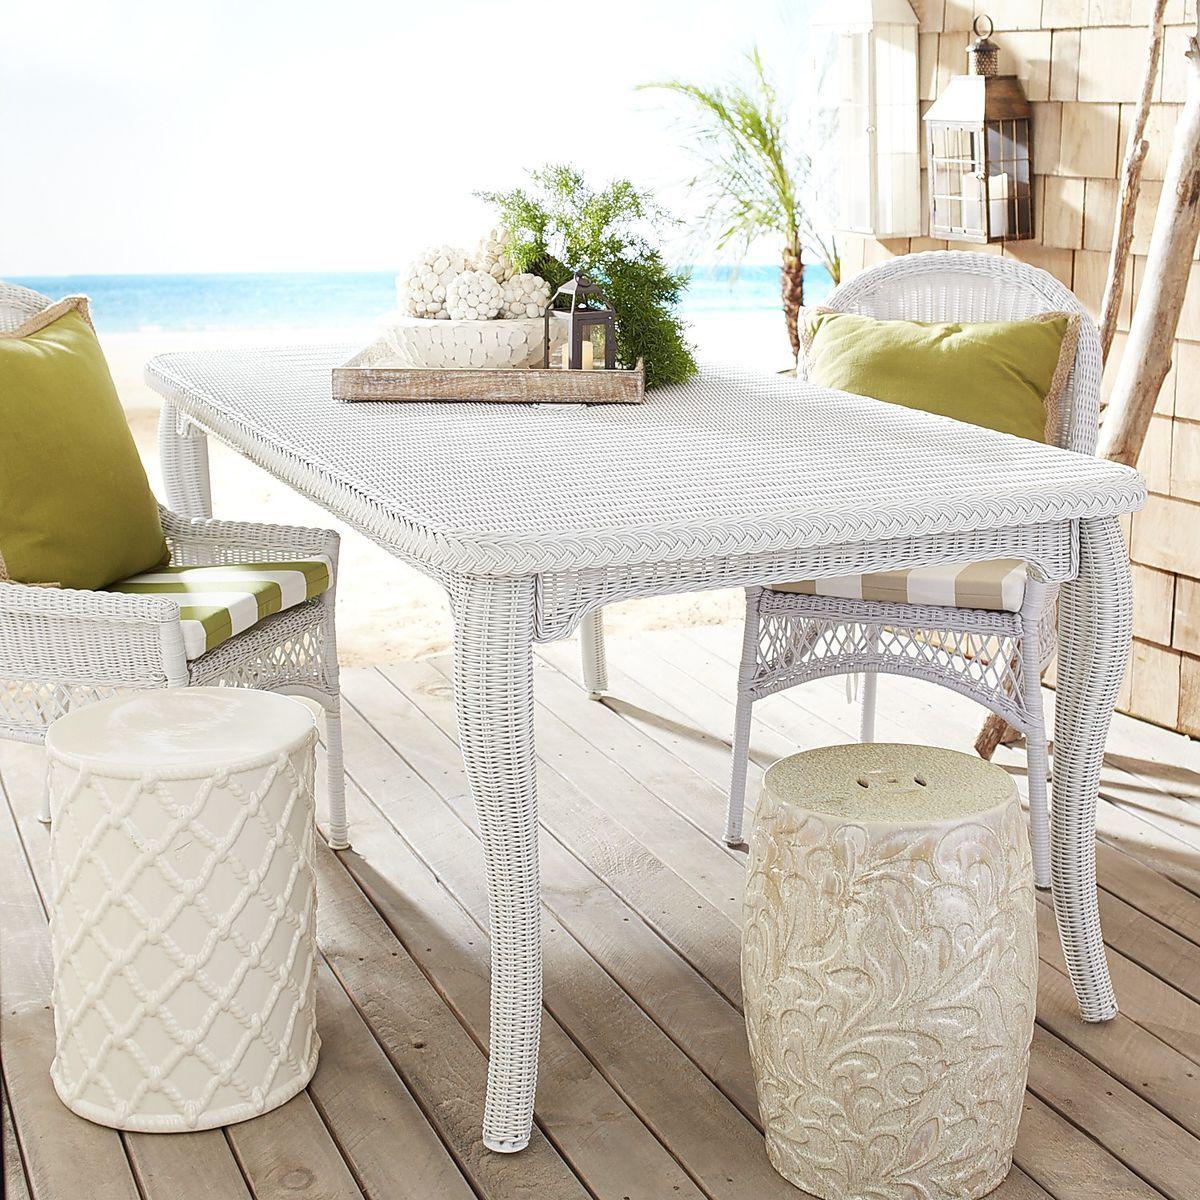 Santa Barbara Dining Table - White